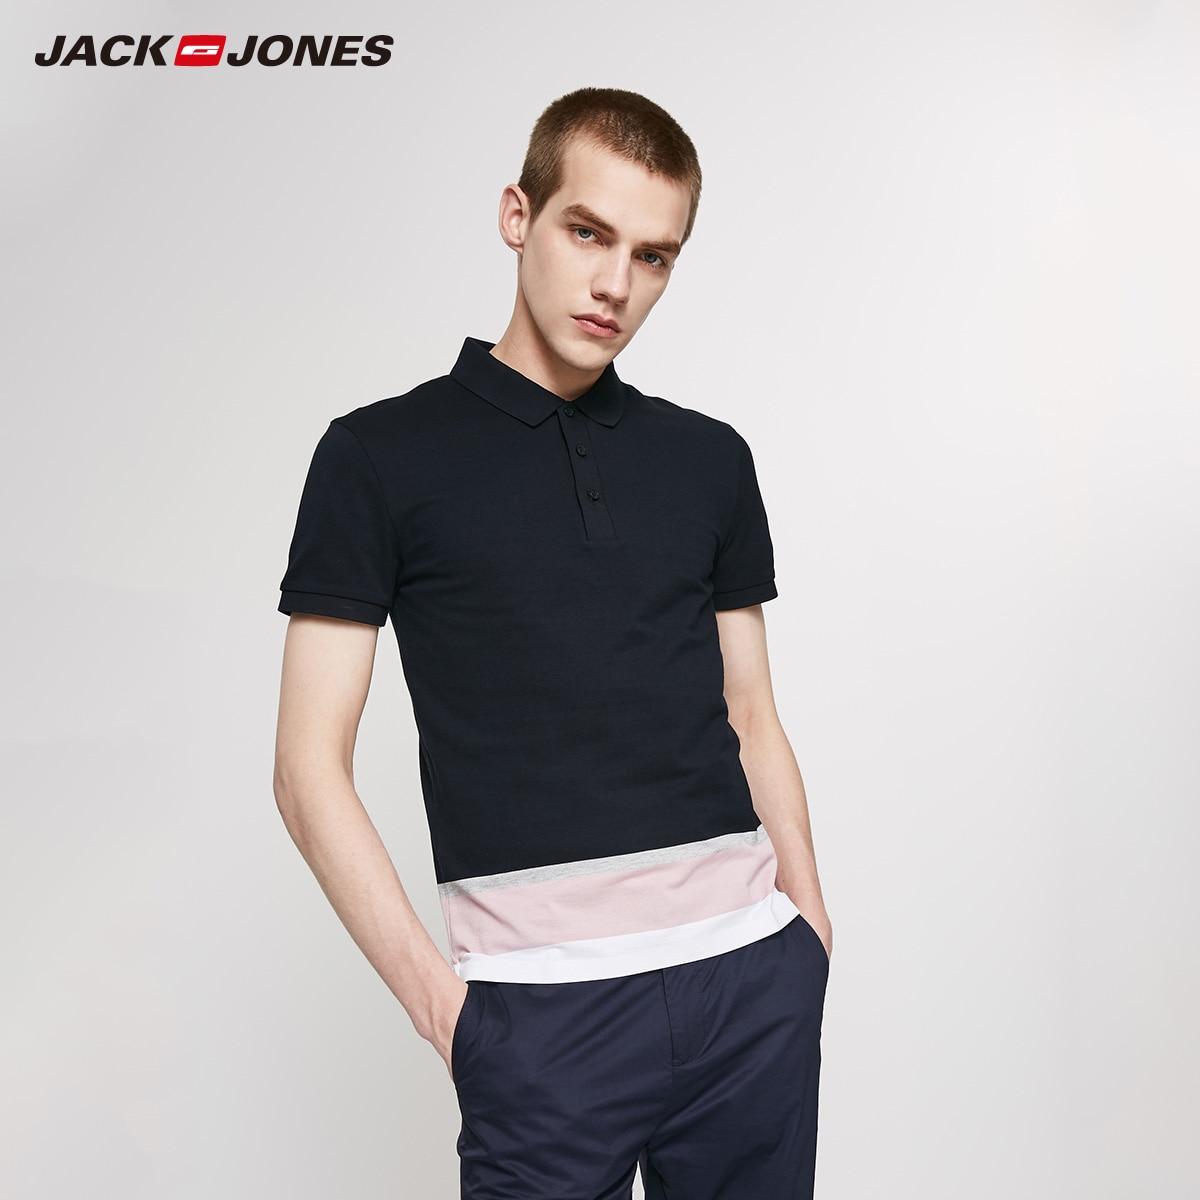 JackJones Men's Slim Fit 100% Cotton Contrasting Stripe Turn-down Collar Short-sleeved T-shirt Basic 219206508